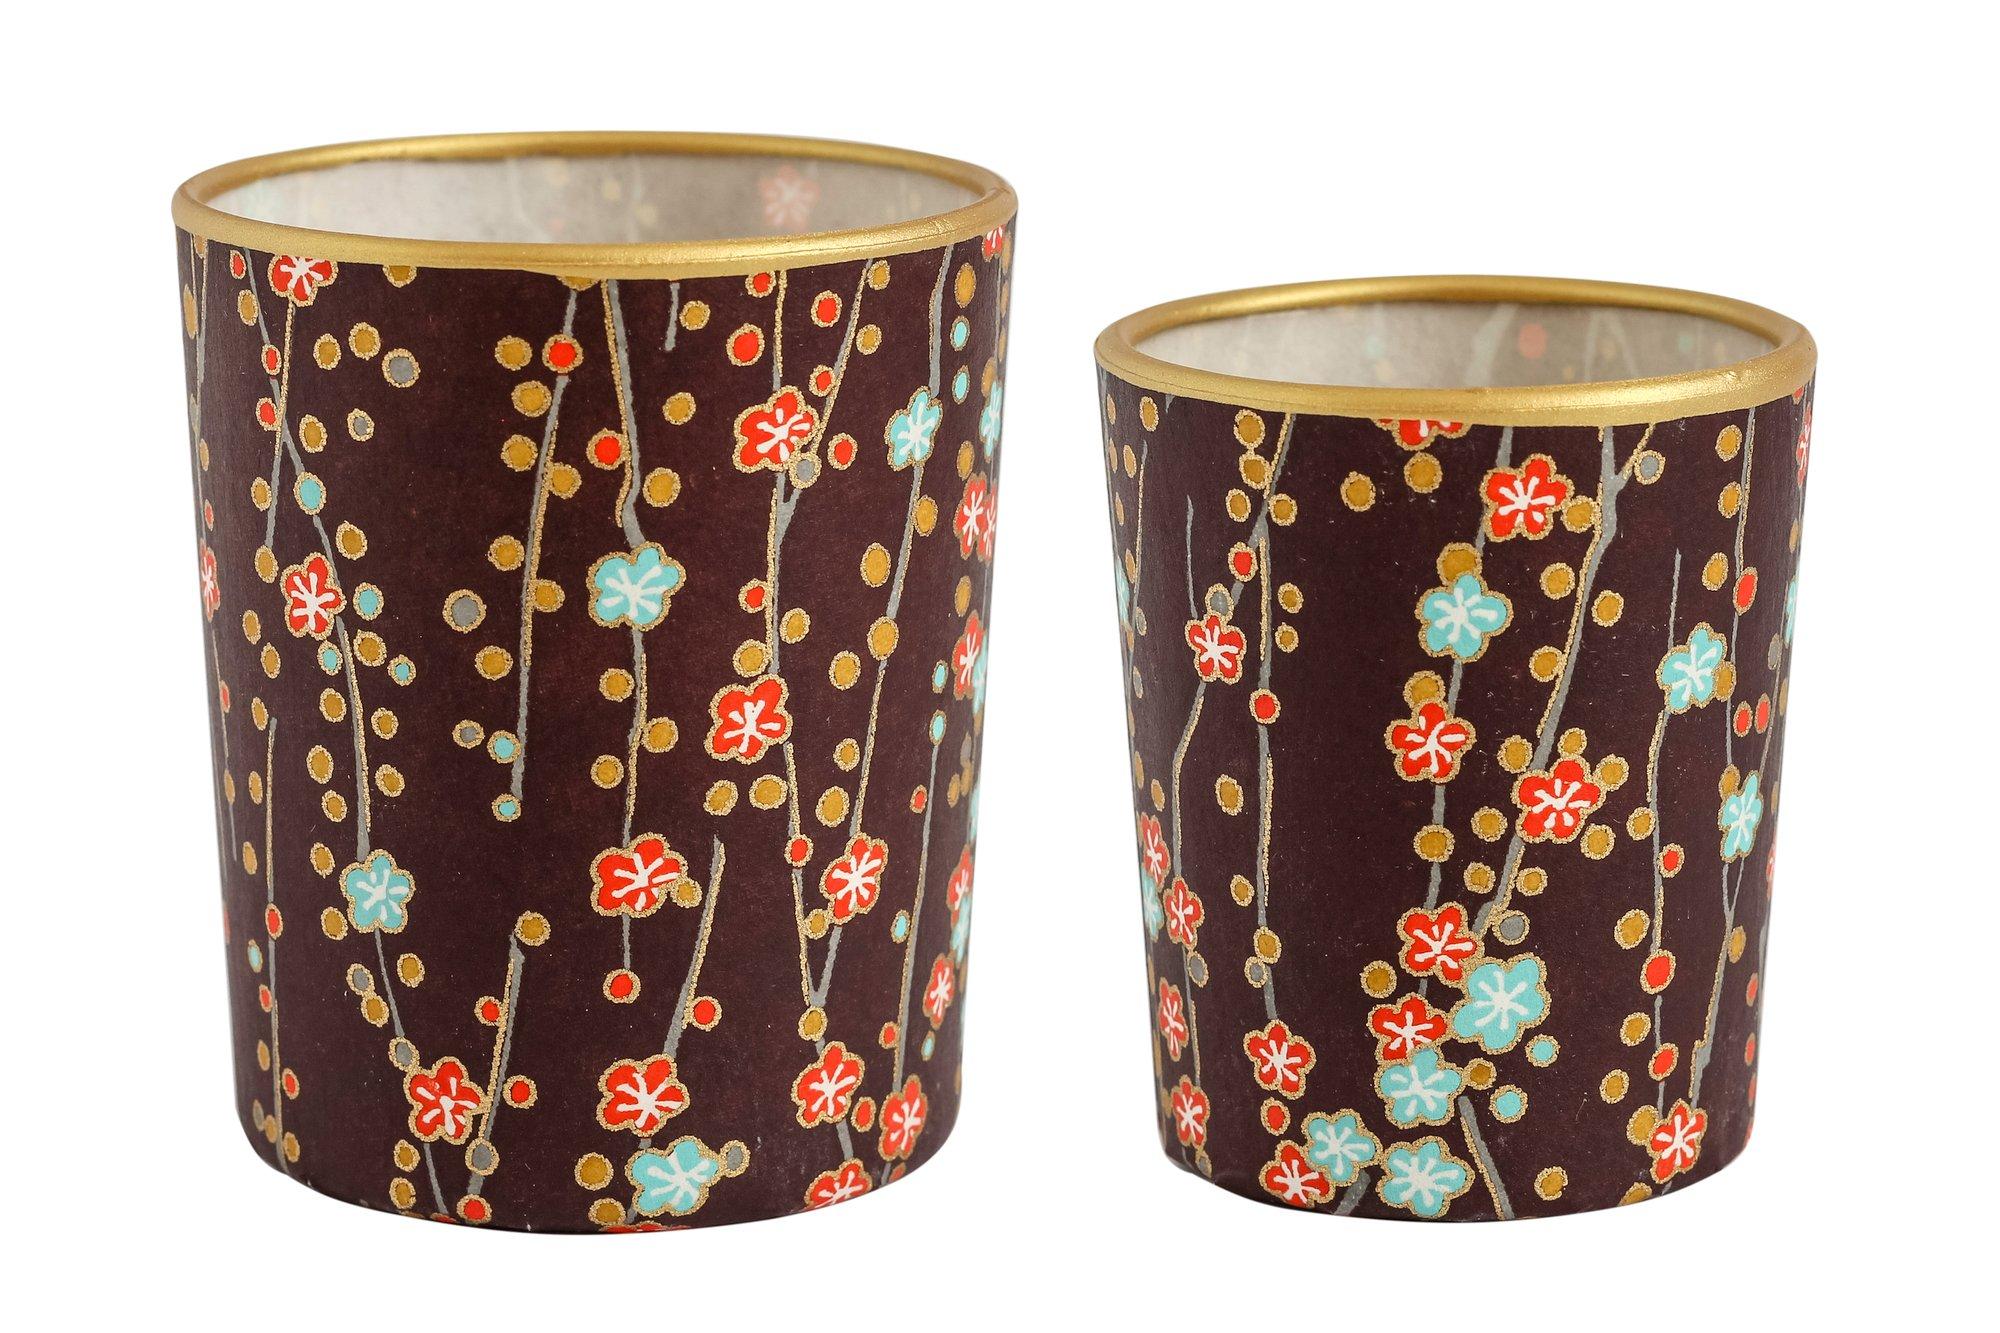 Image of Candle holders * Liz * Chocolat